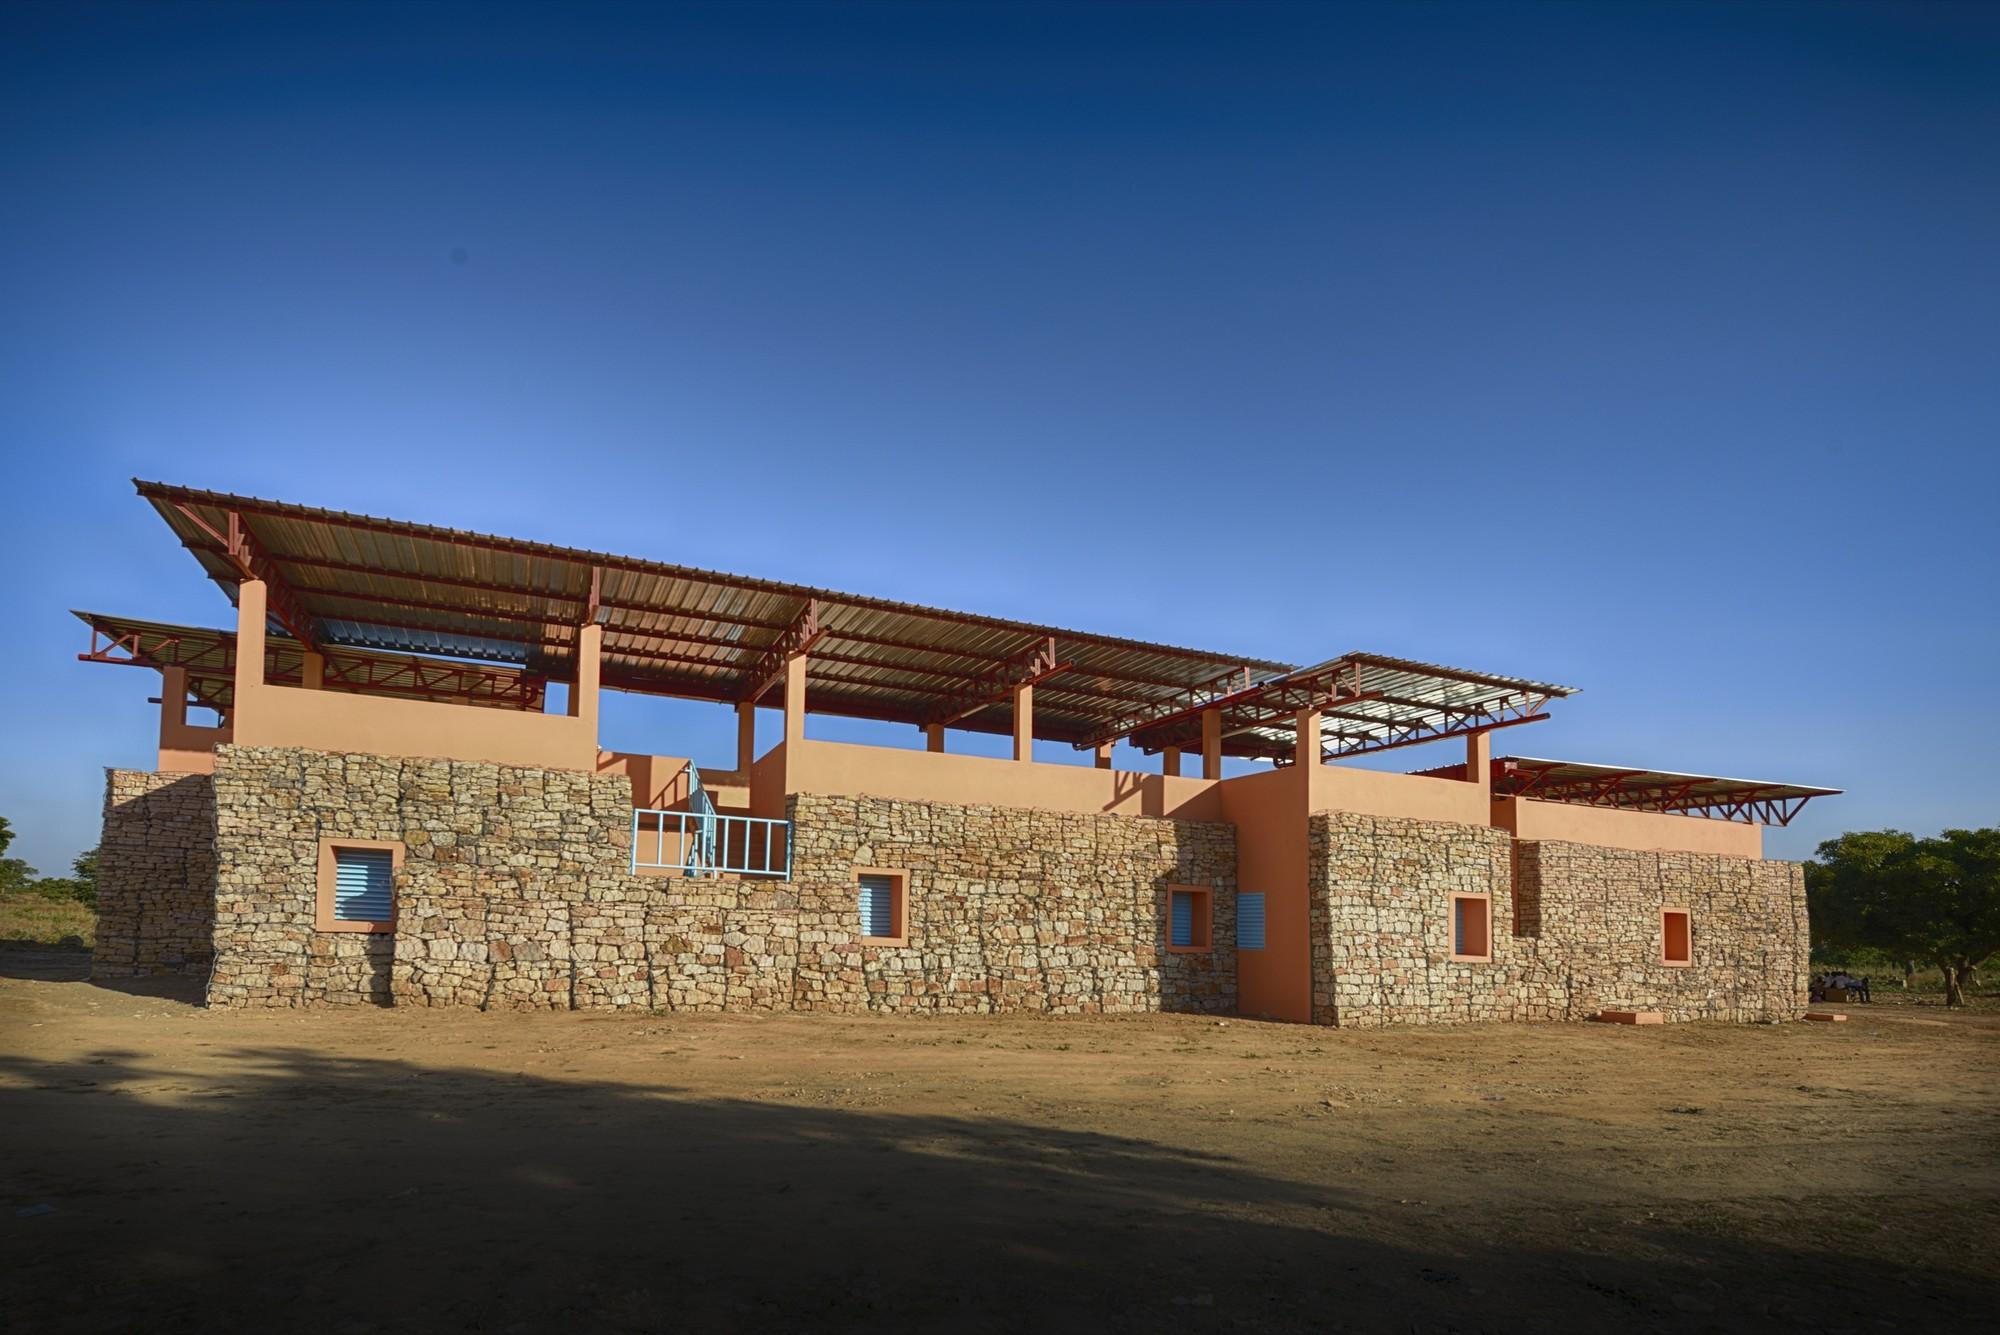 Falatow Jigiyaso Orphanage / F8 architecture + Gérard Violante, © Vanja Bjelobaba